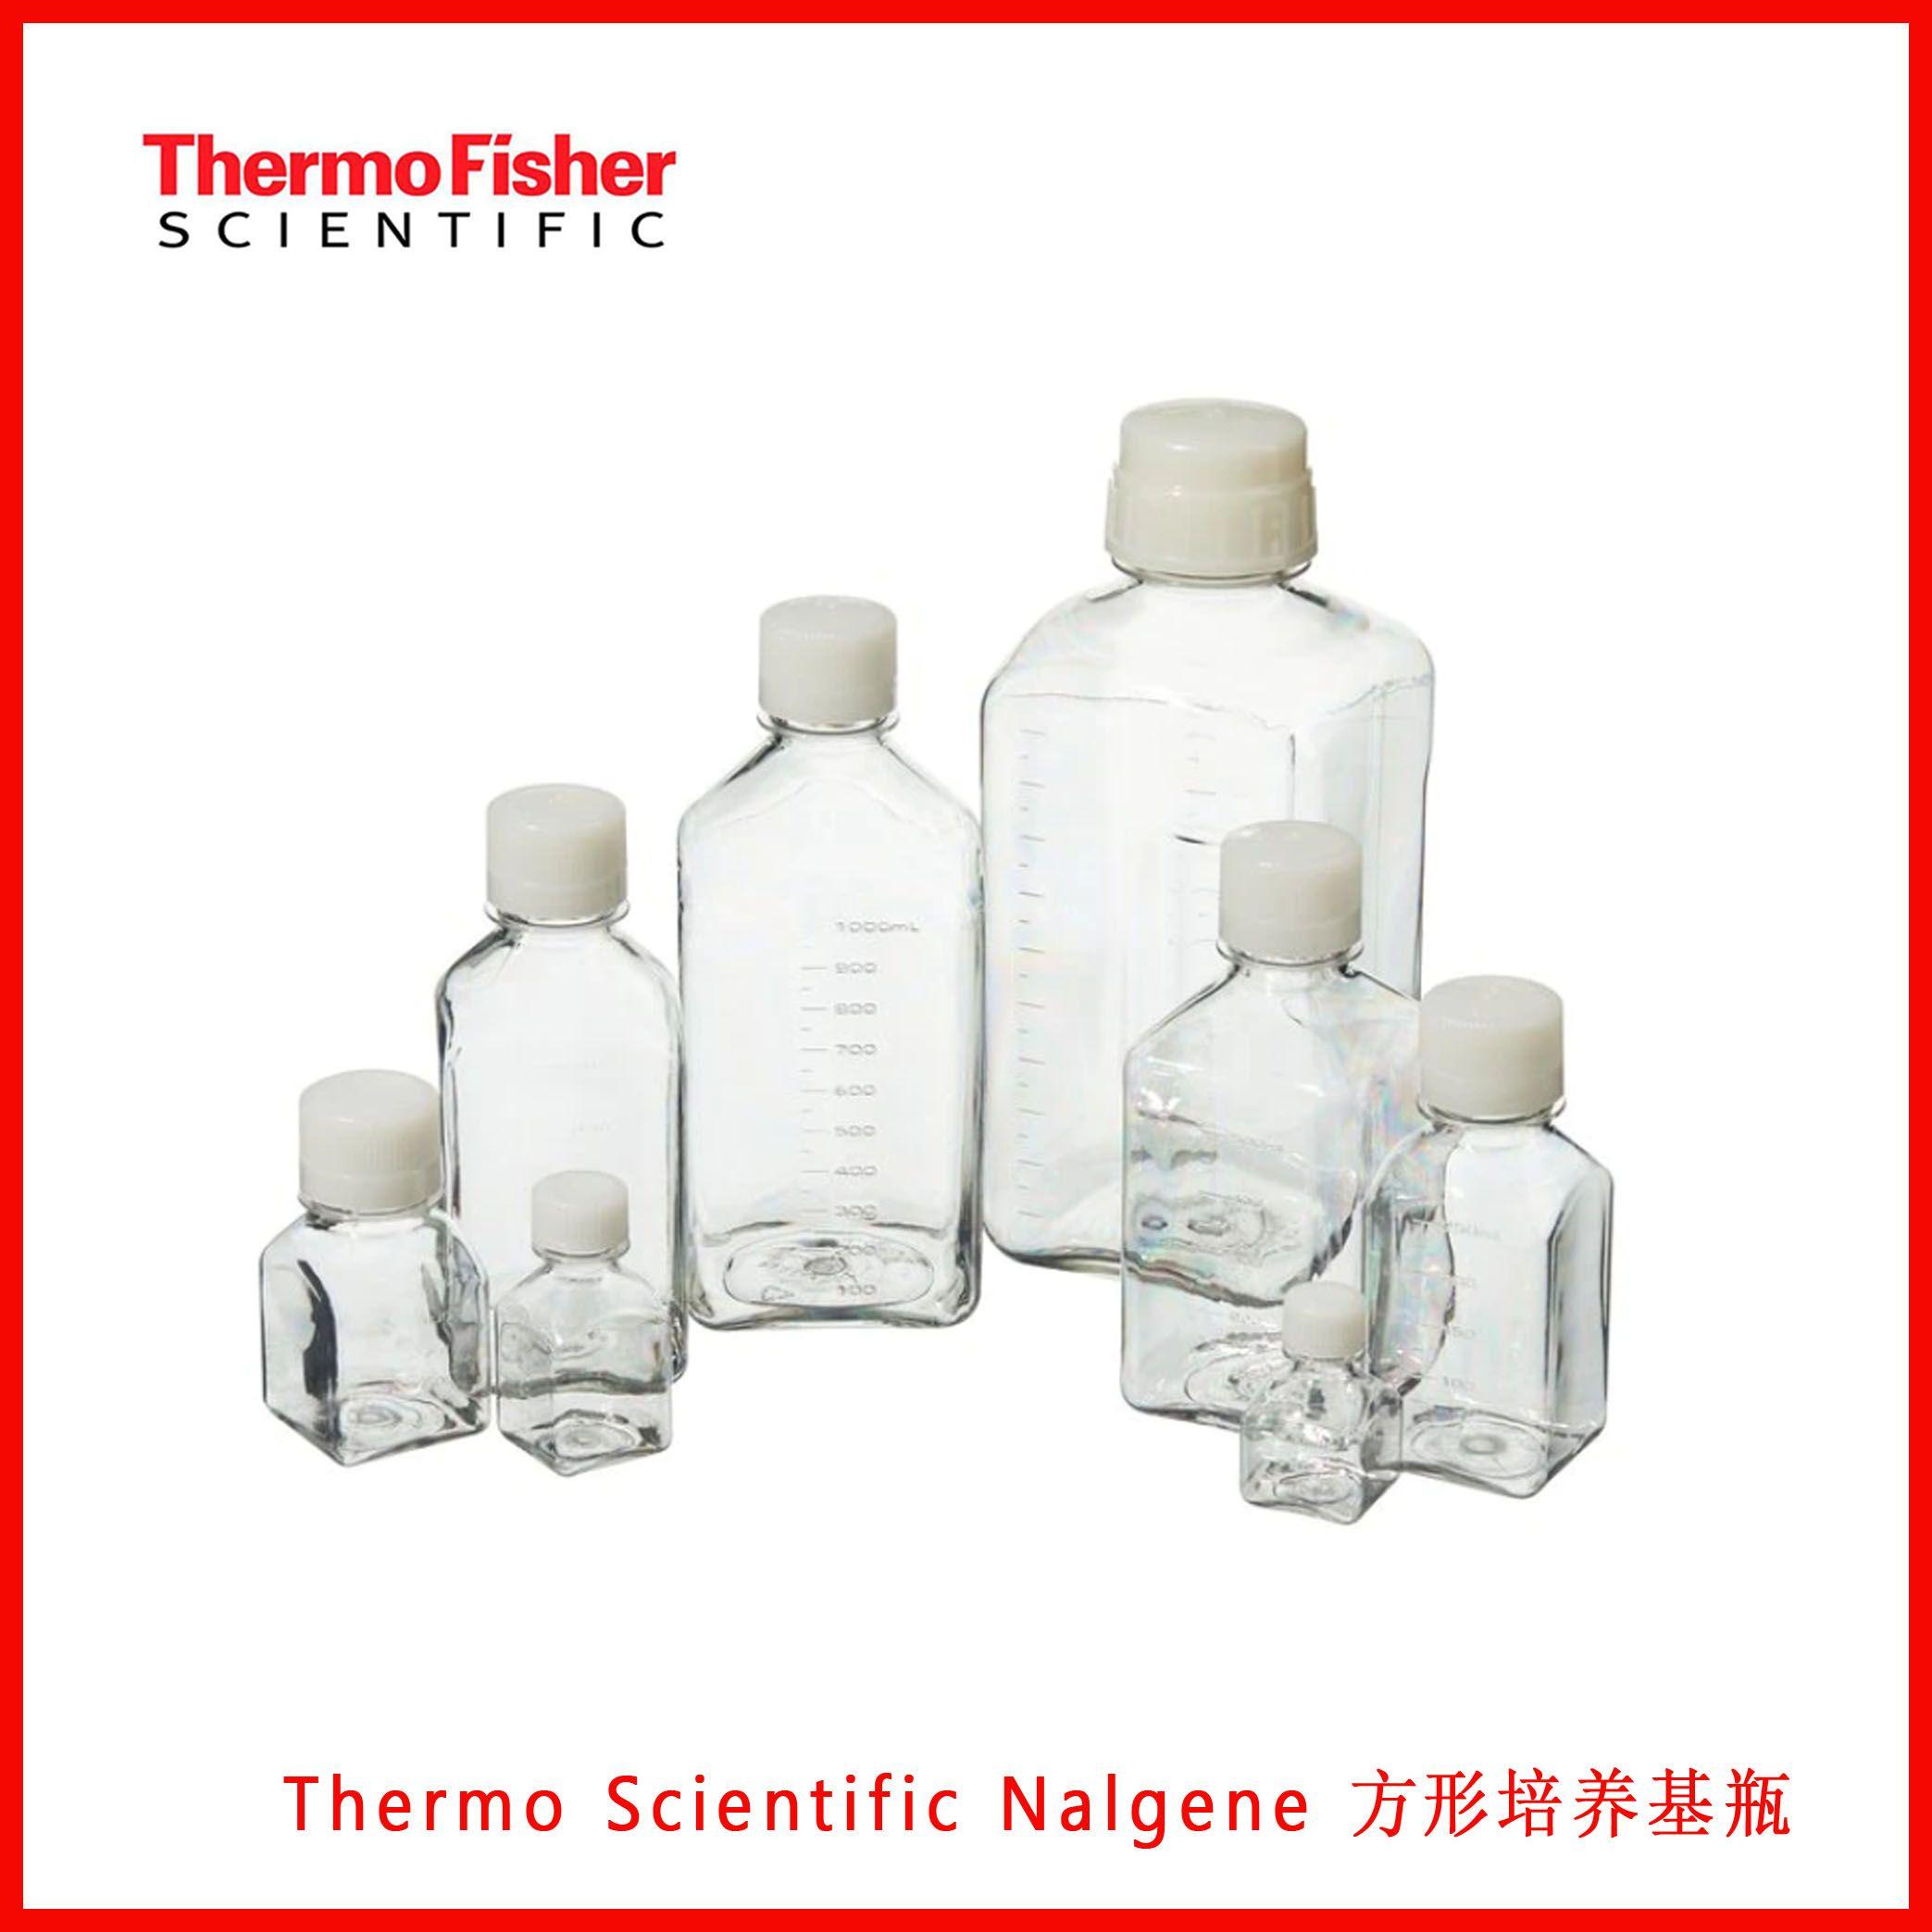 Thermo Scientific Nalgene PET方形培养基瓶,带盖,无菌, 收缩薄膜托盘,现货